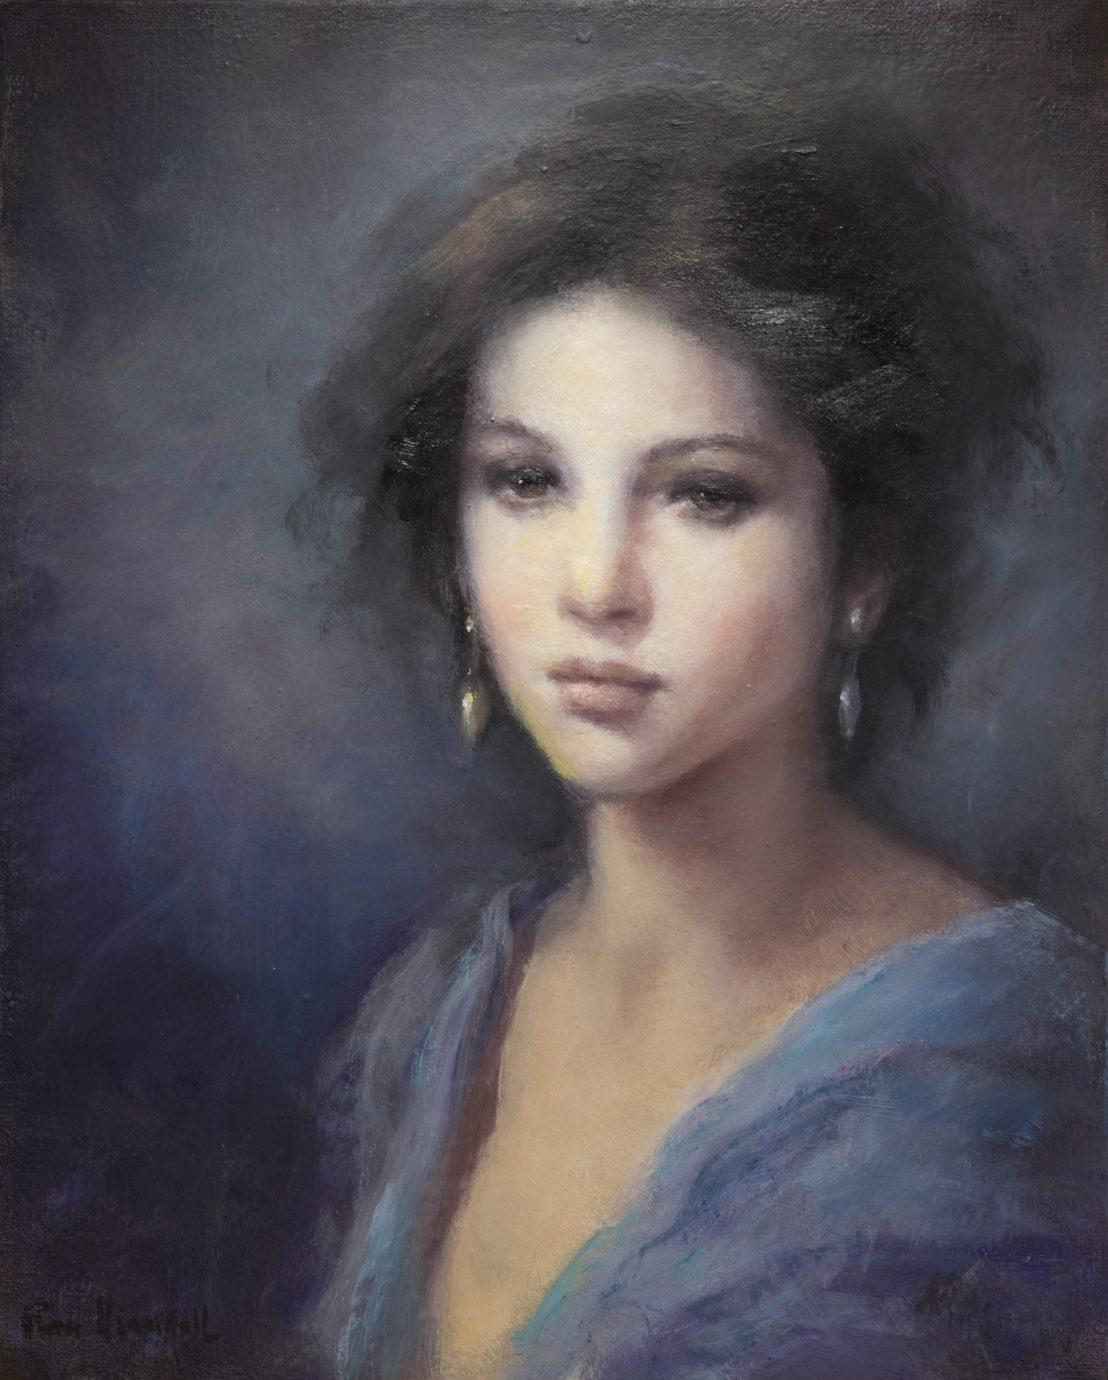 Retrato - Roser Vinardell - Óleo sobre lienzo